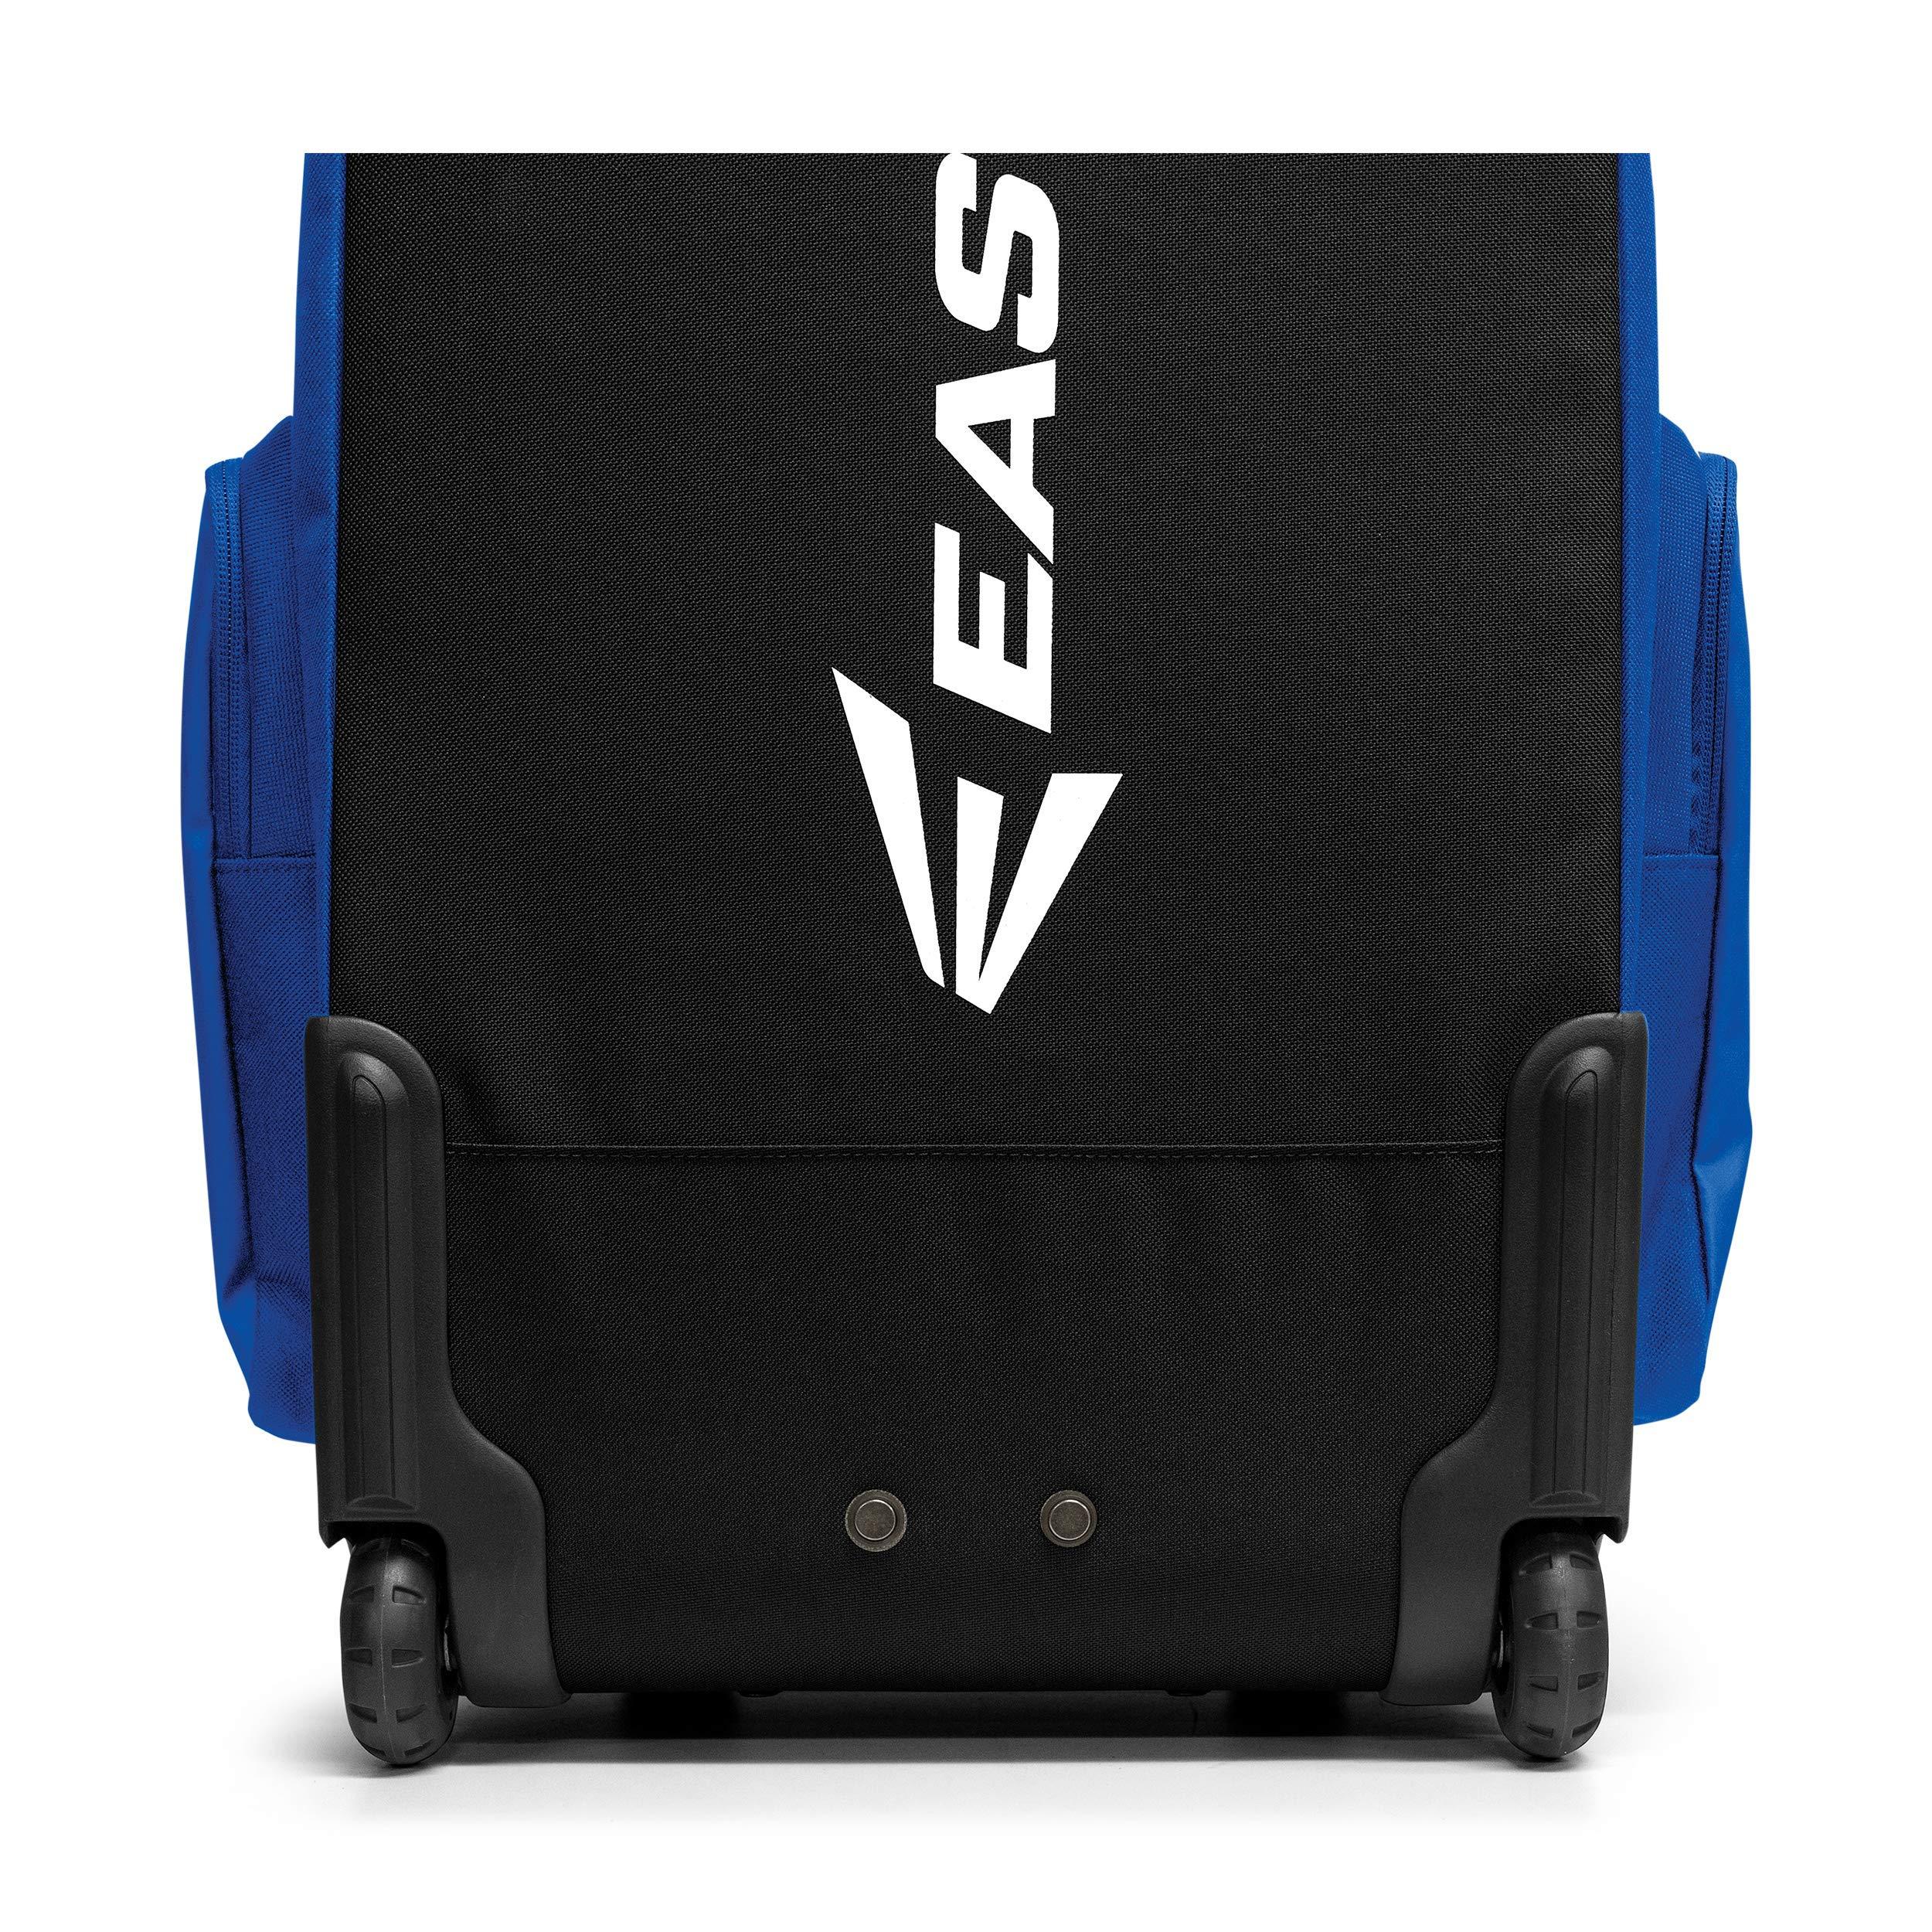 EASTON TRAVELER Bat & Equipment Wheeled Bag | Baseball Softball | 2019 | Orange | 4 Bat Sleeves | Vented Gear & Shoe Compartments | 2 Side Zippered Pockets | Telescope Handle | Stands Up | Fence Hook by Easton (Image #4)